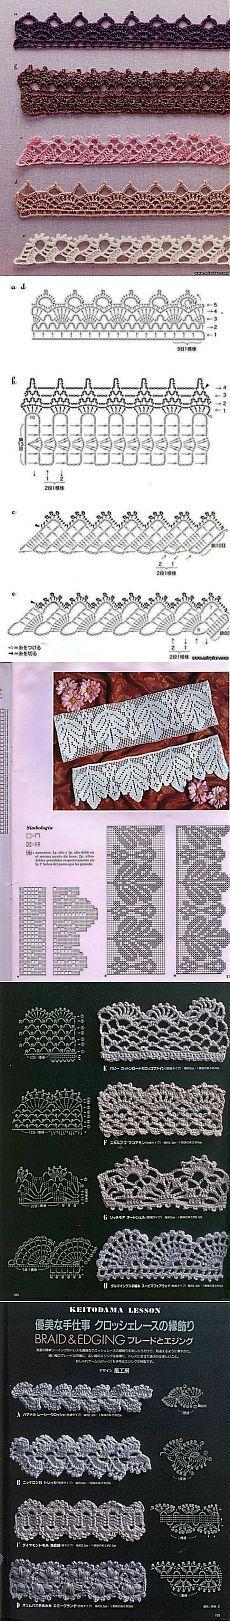 Crochet Crochet Edgings And Crochet Stitches